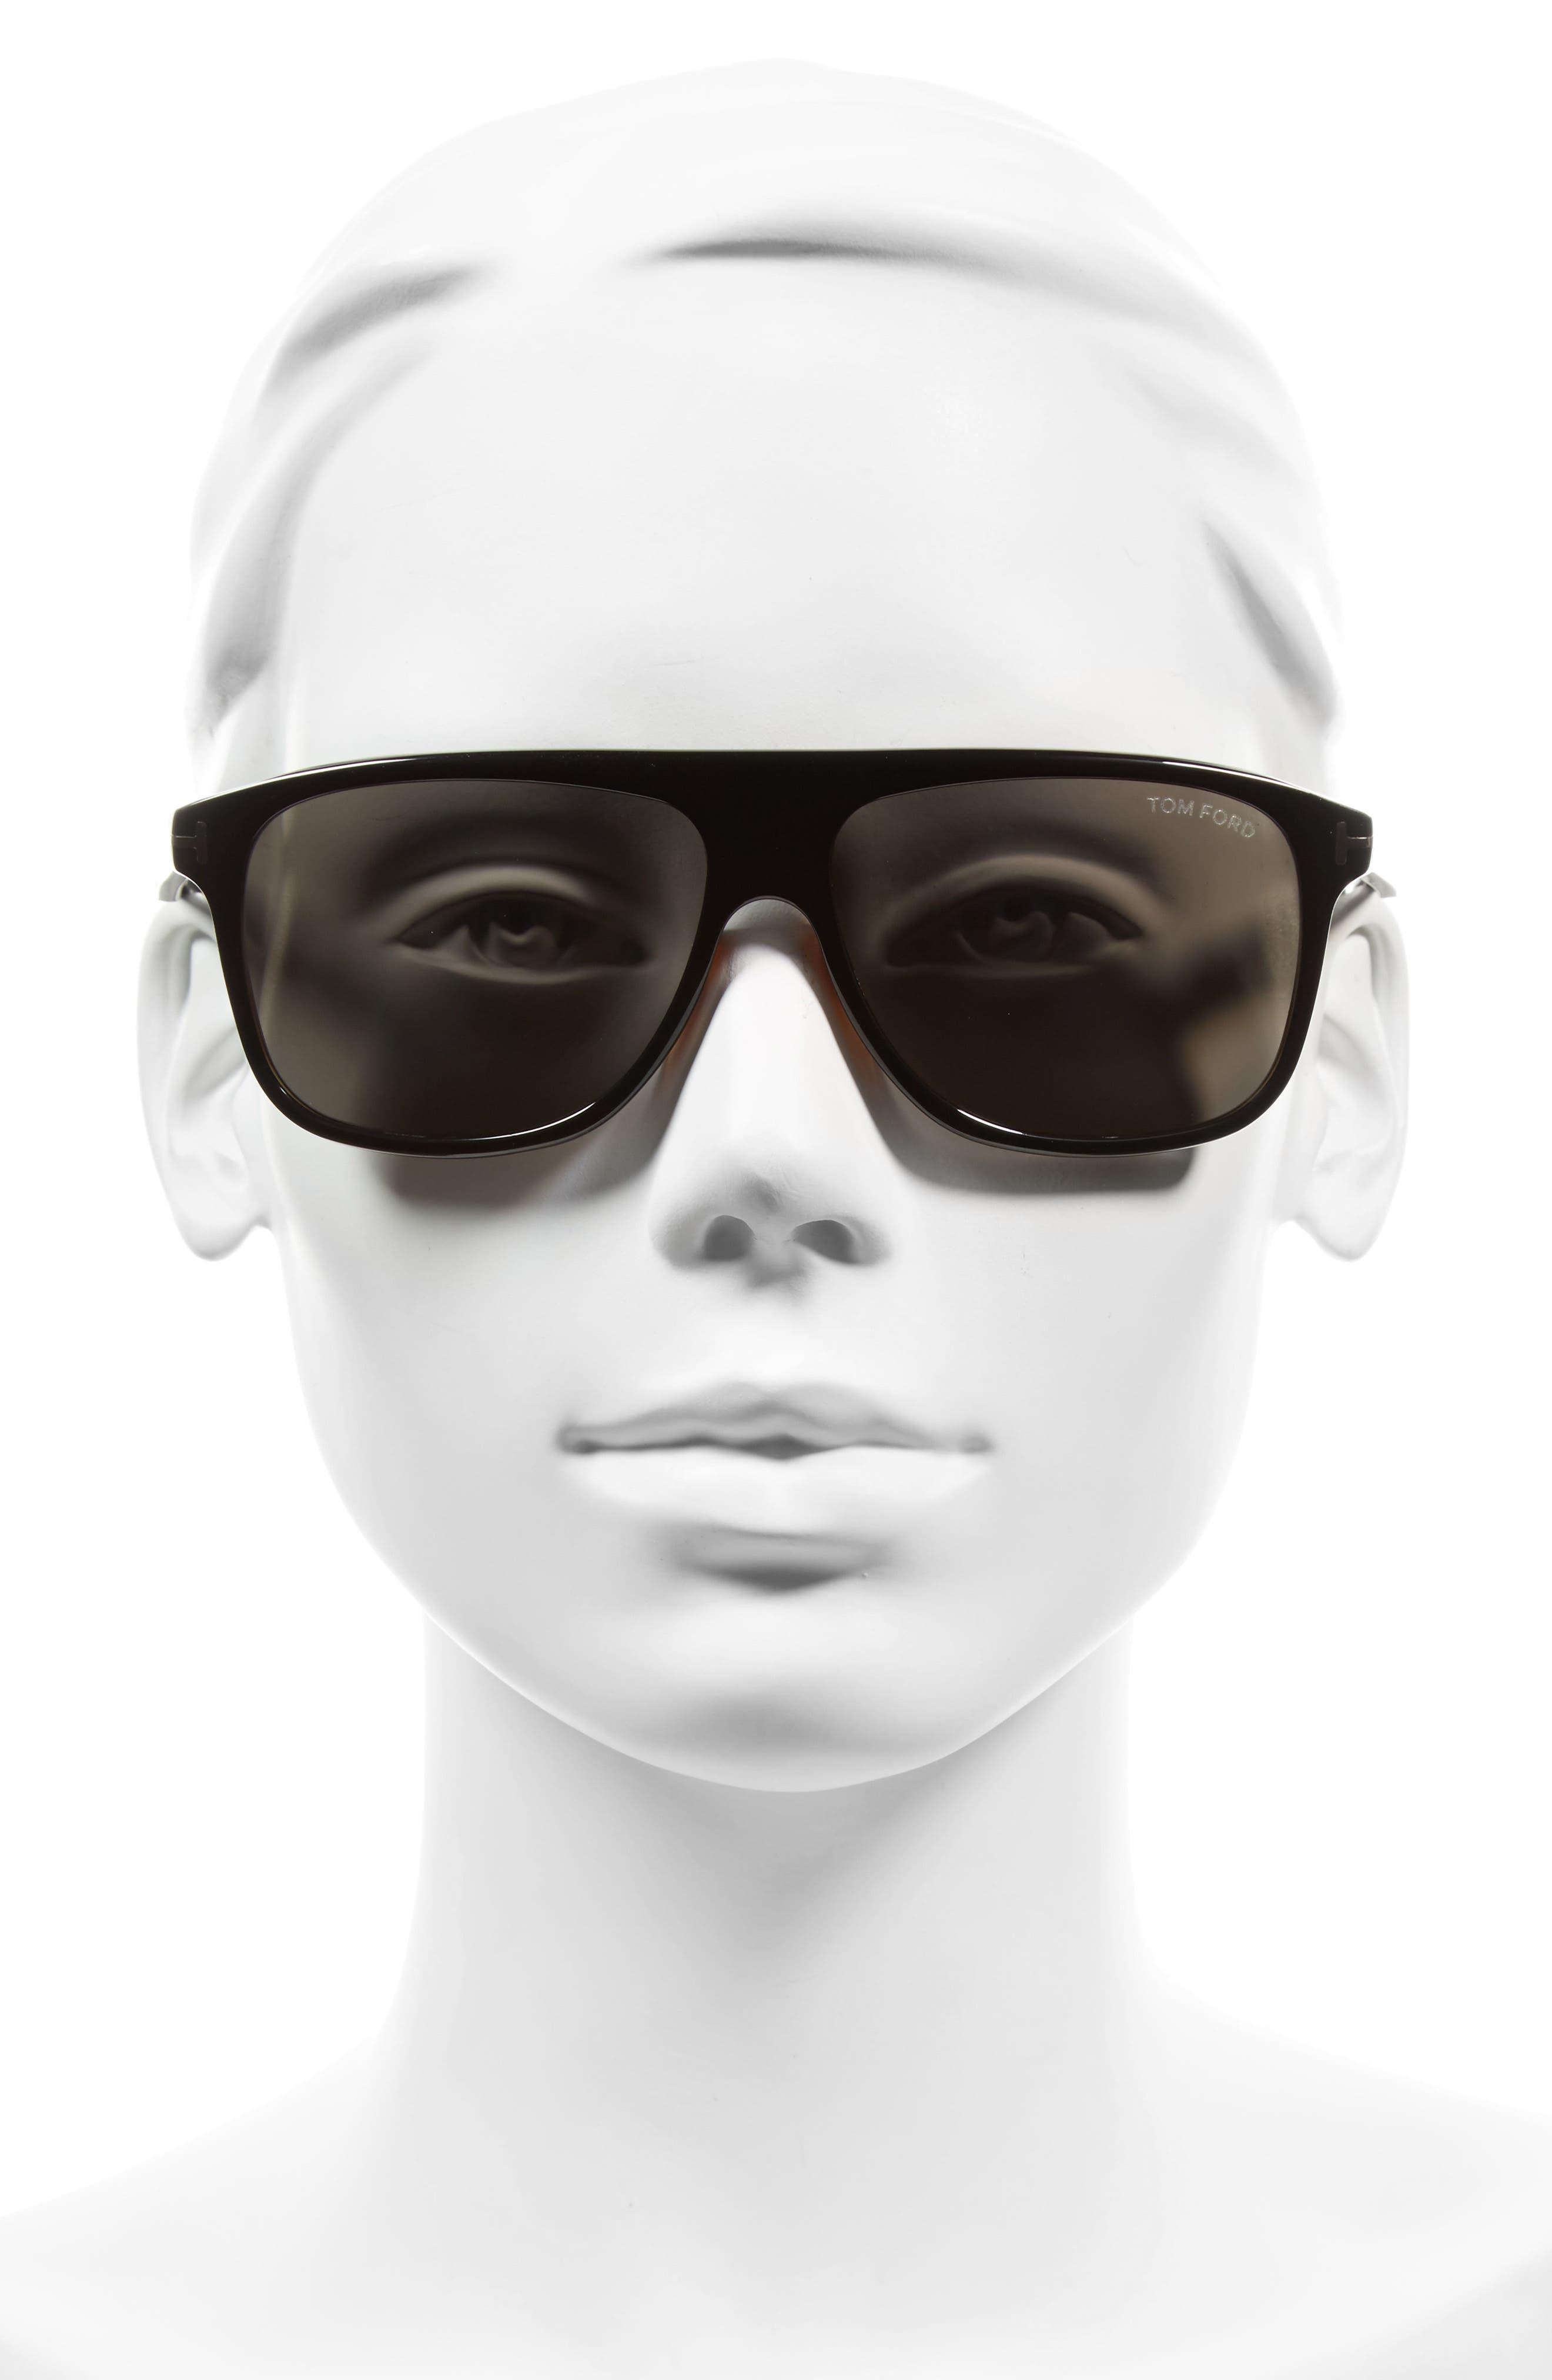 Inigo 59mm Flat Top Sunglasses,                             Alternate thumbnail 2, color,                             001